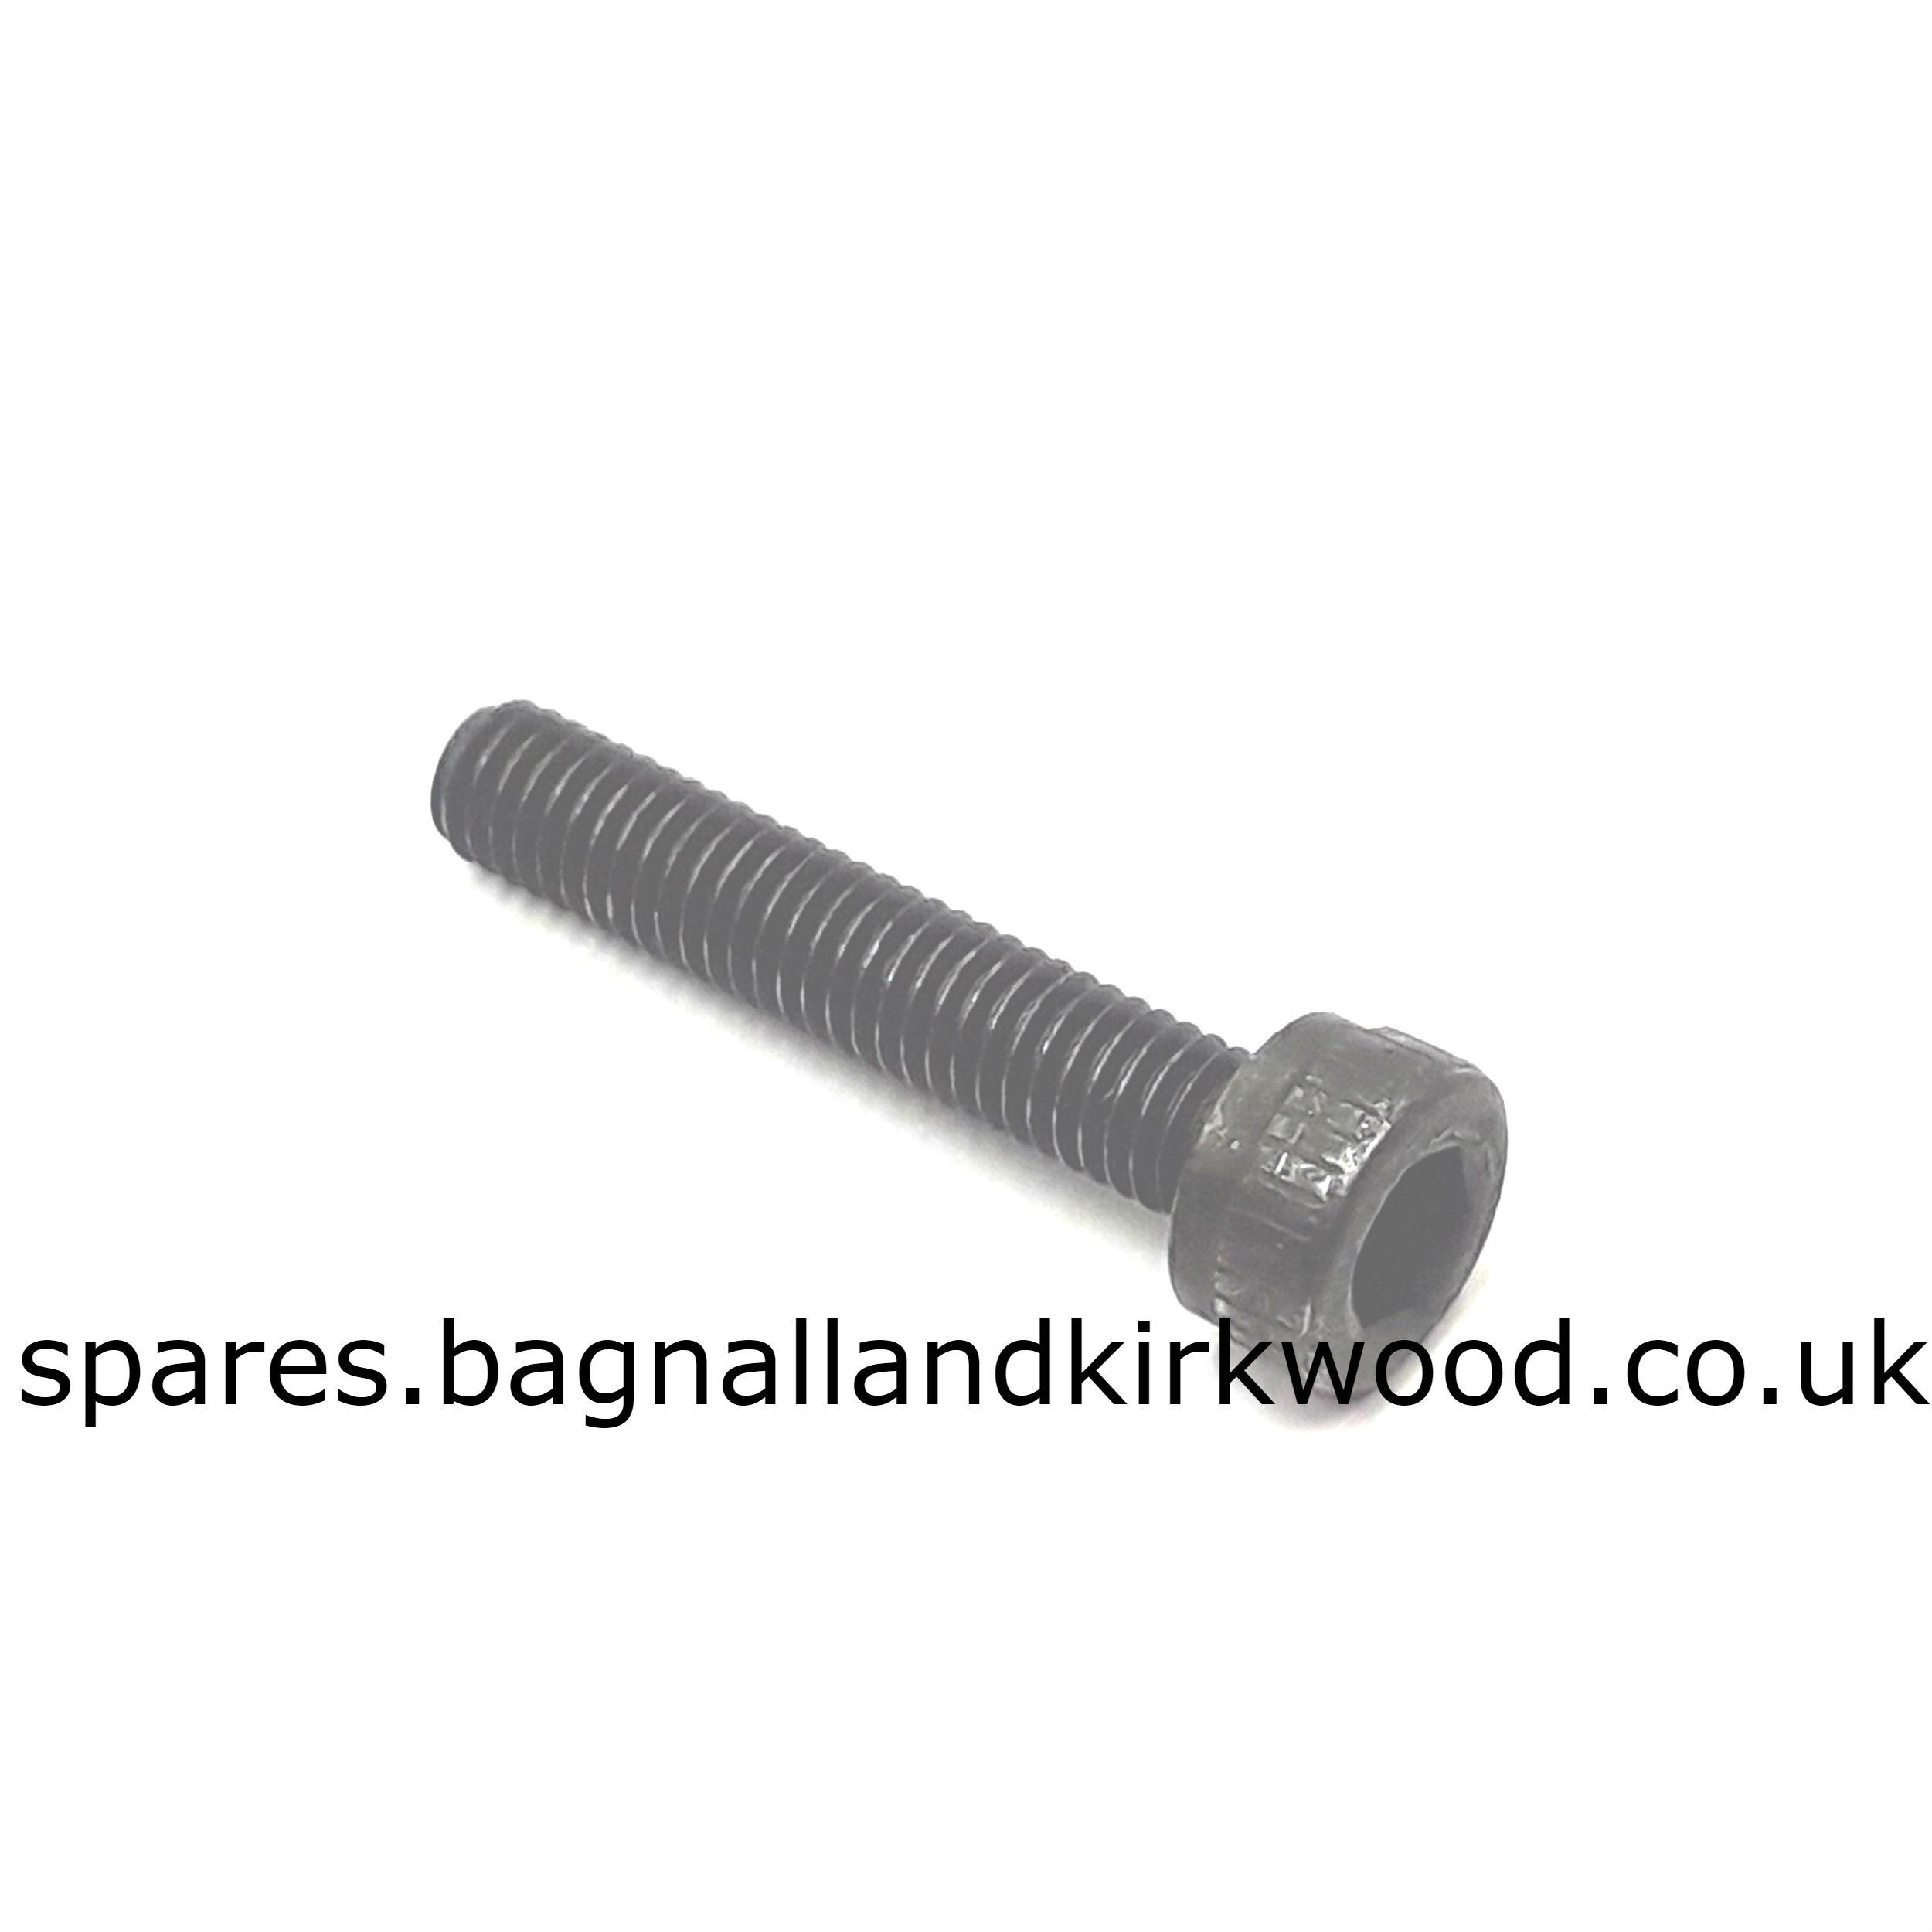 FX Impact Breech Seals - Bagnall and Kirkwood Airgun Spares